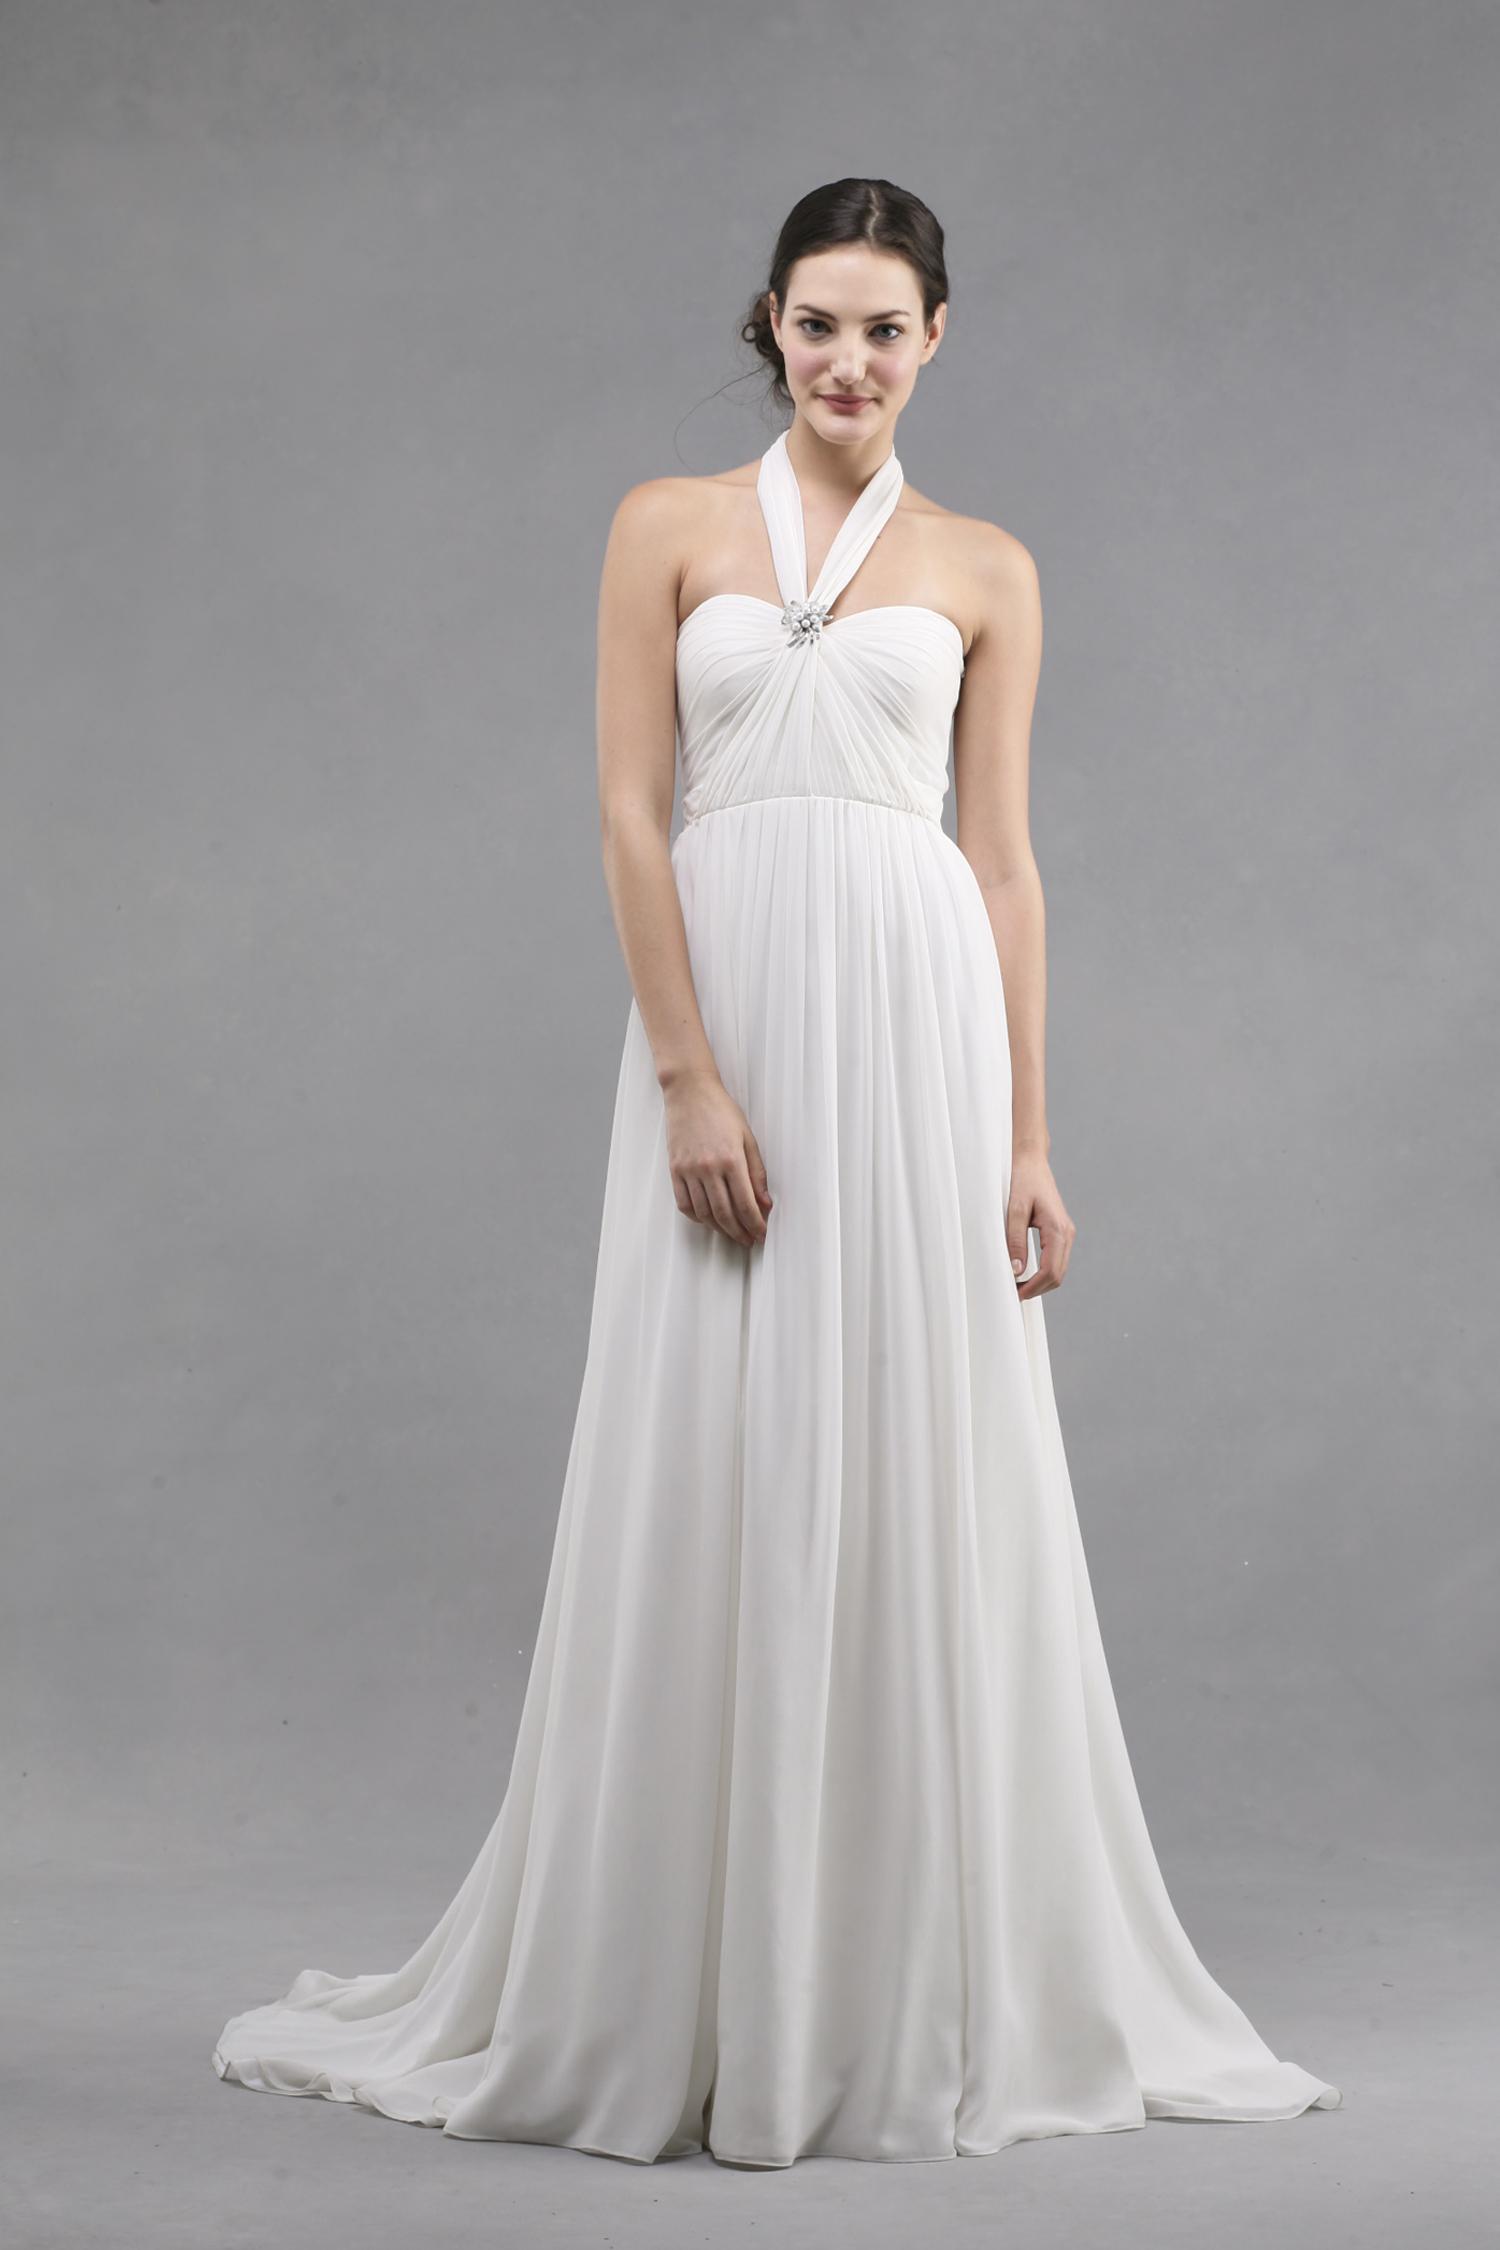 Jenny Yoo Wedding Dress Colllection Spring Summer 2013 Bridal Gowns Monarch Criss Cross Halter